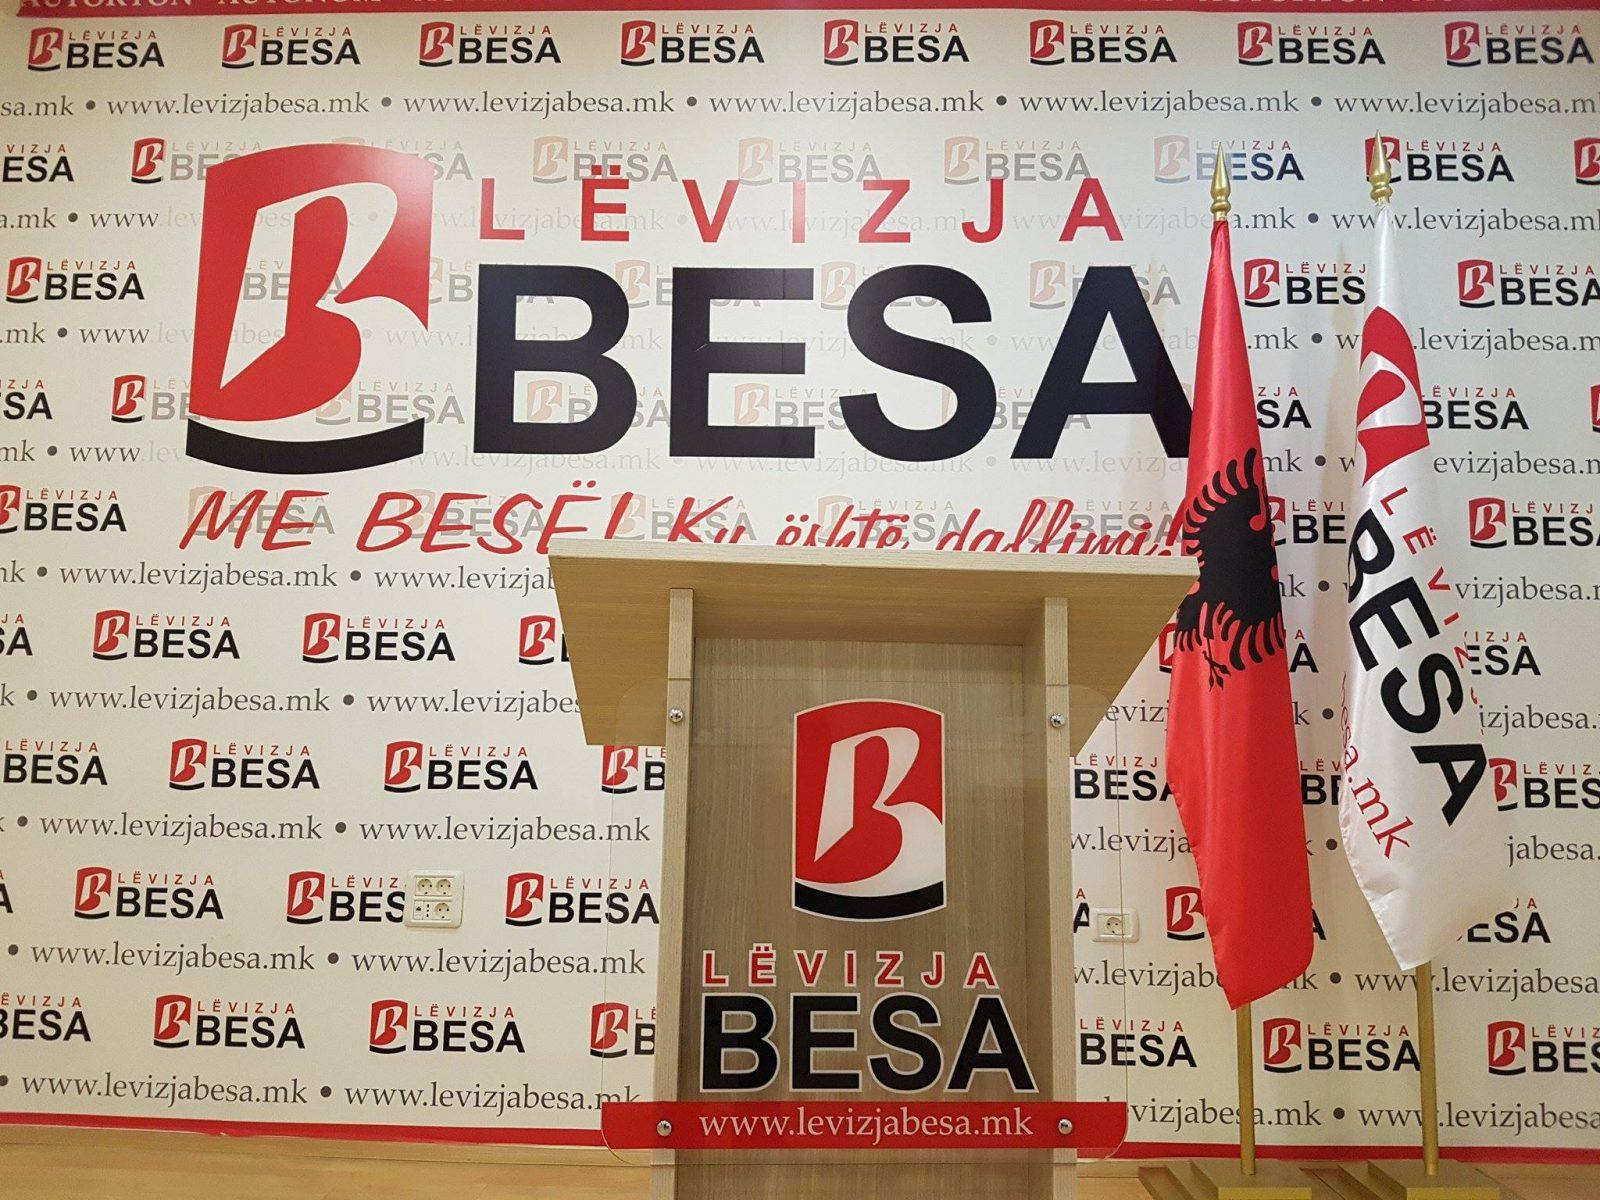 levizja-besa-1